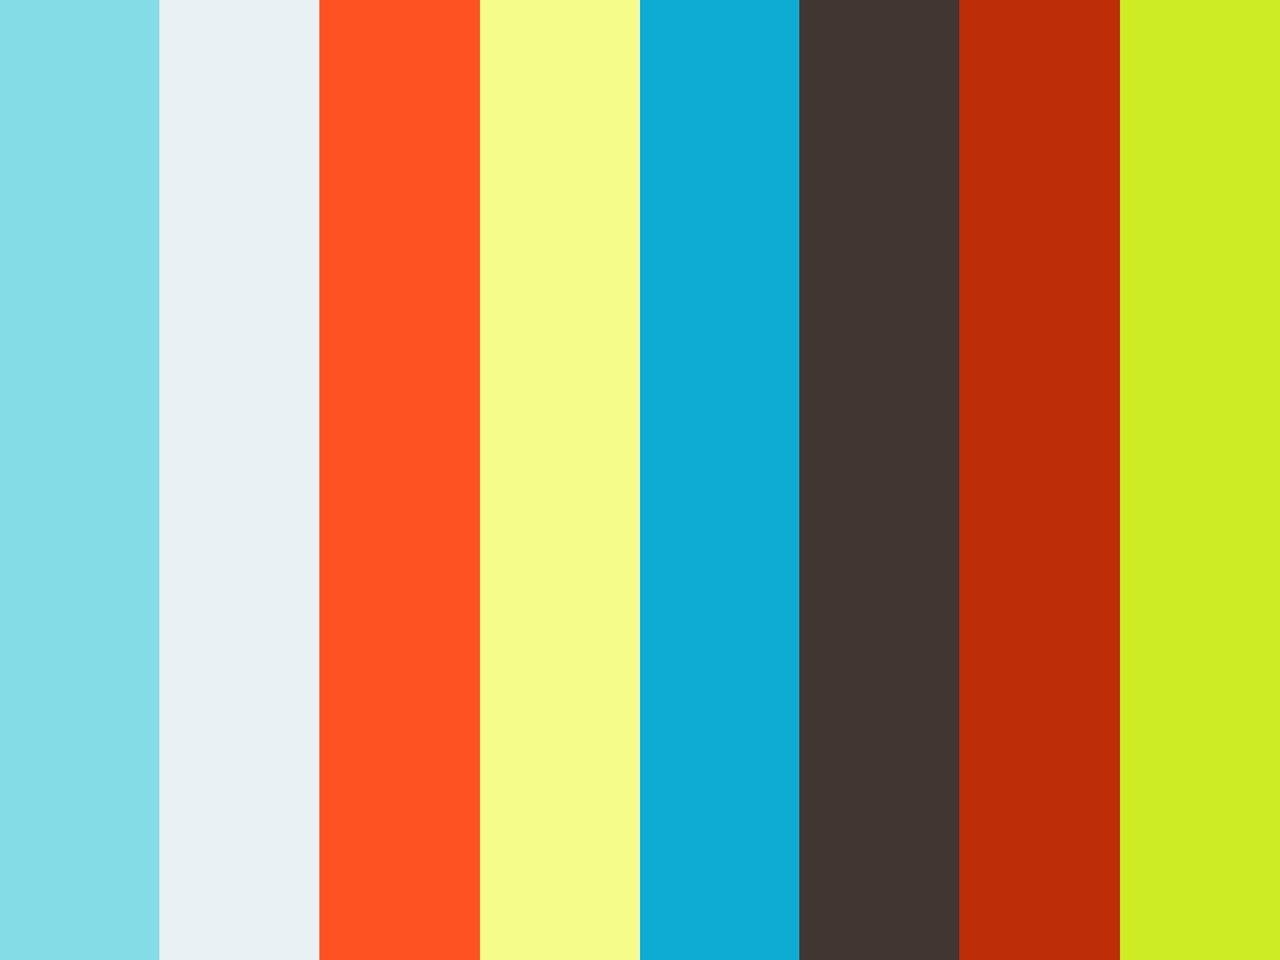 Chroma Key (Green Screen): HUE Animation Tutorial